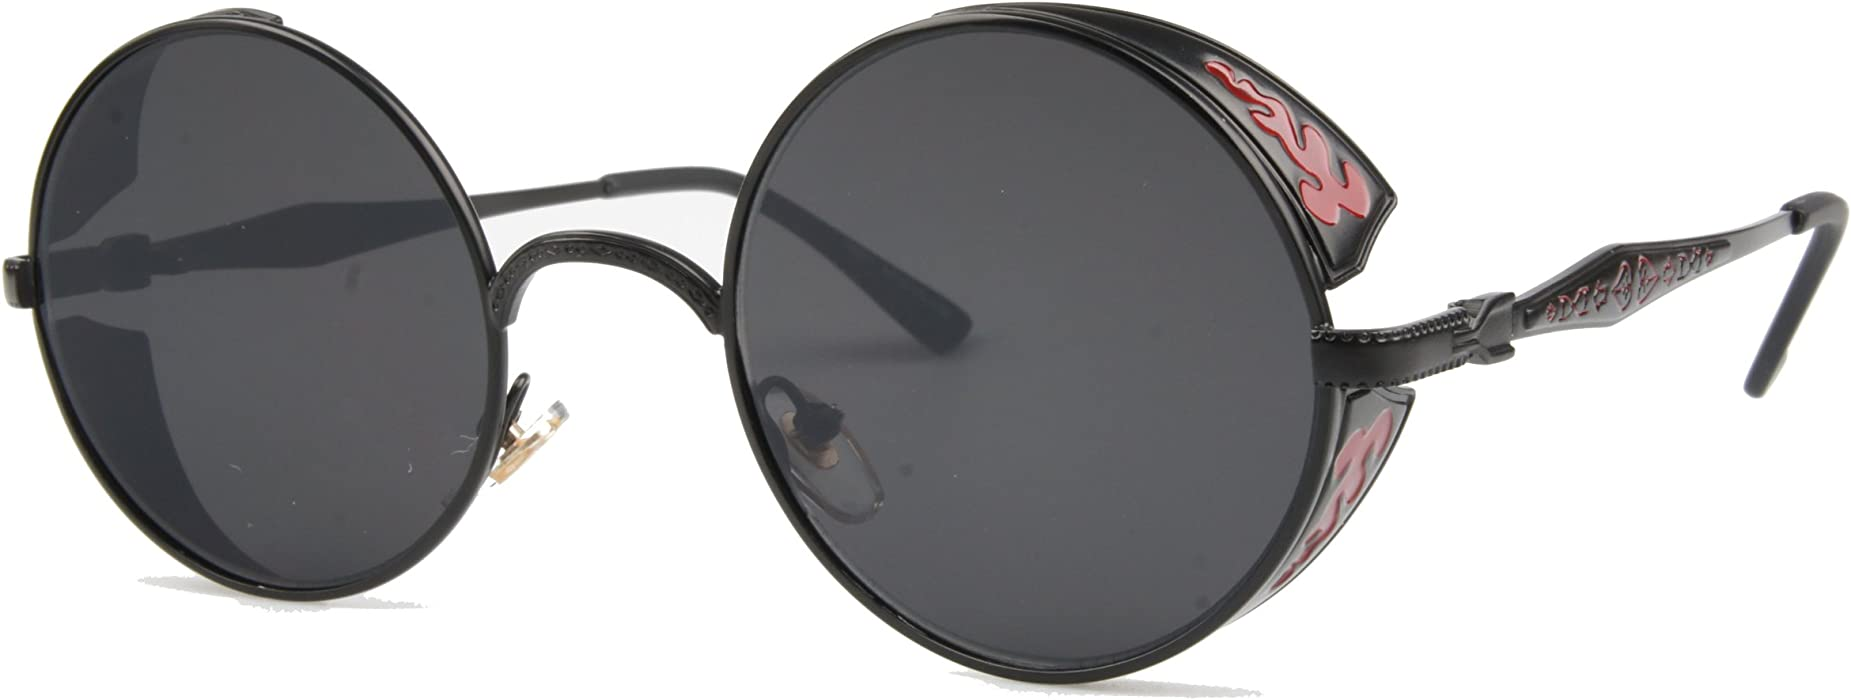 f5c4f34e18b VIVIAN   VINCENT Vintage Hippie Retro Metal Round Circle Frame Sunglasses ( Black Frame Black Lens